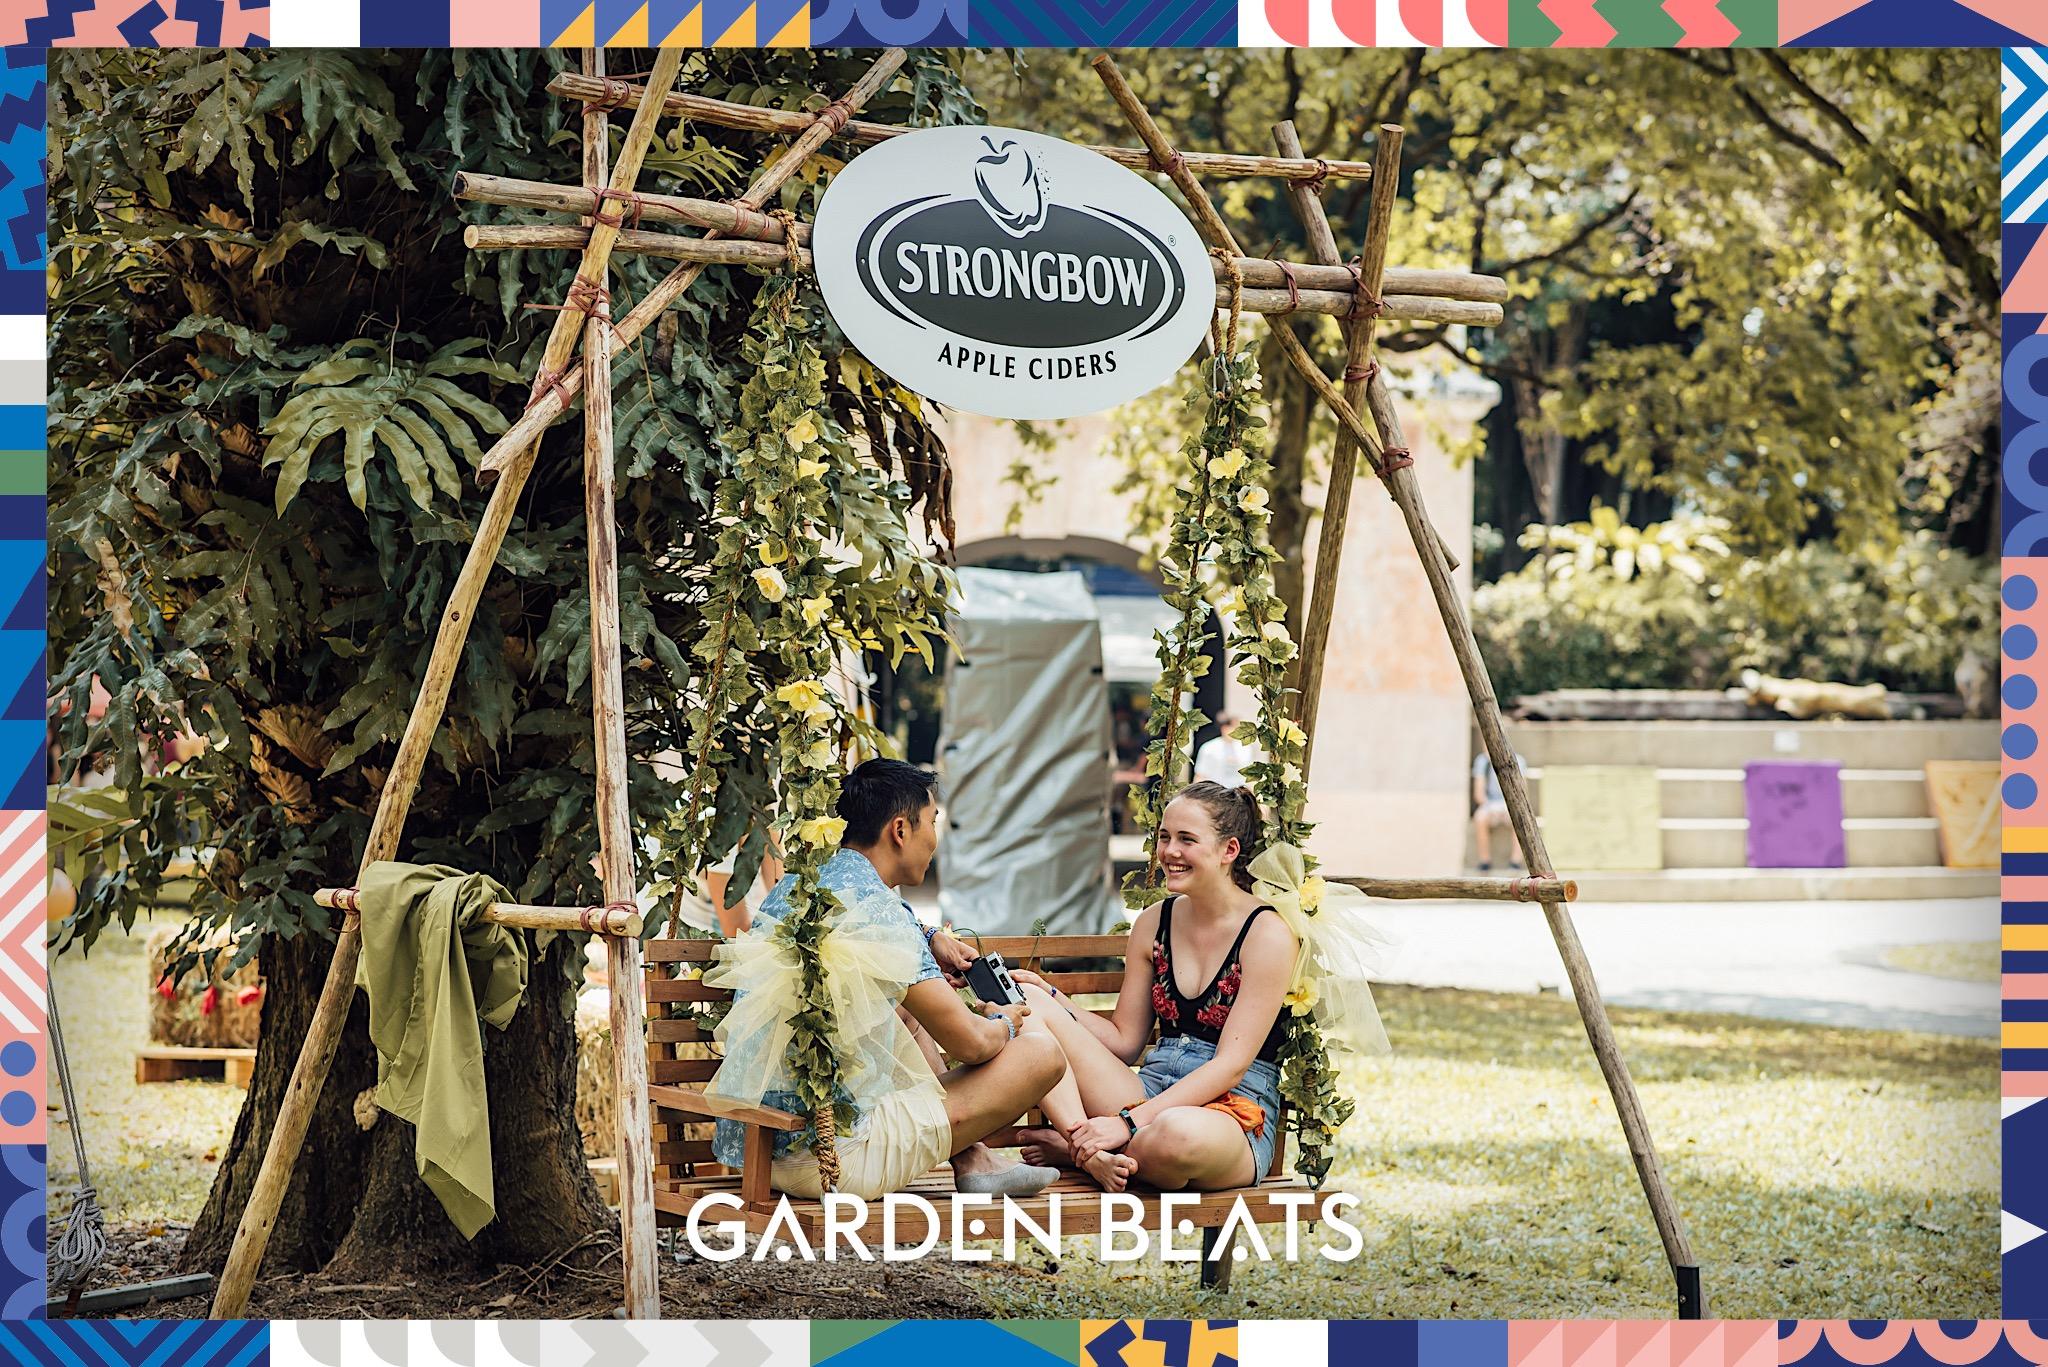 18032017_GardenBeats_Colossal170_WatermarkedGB.jpg